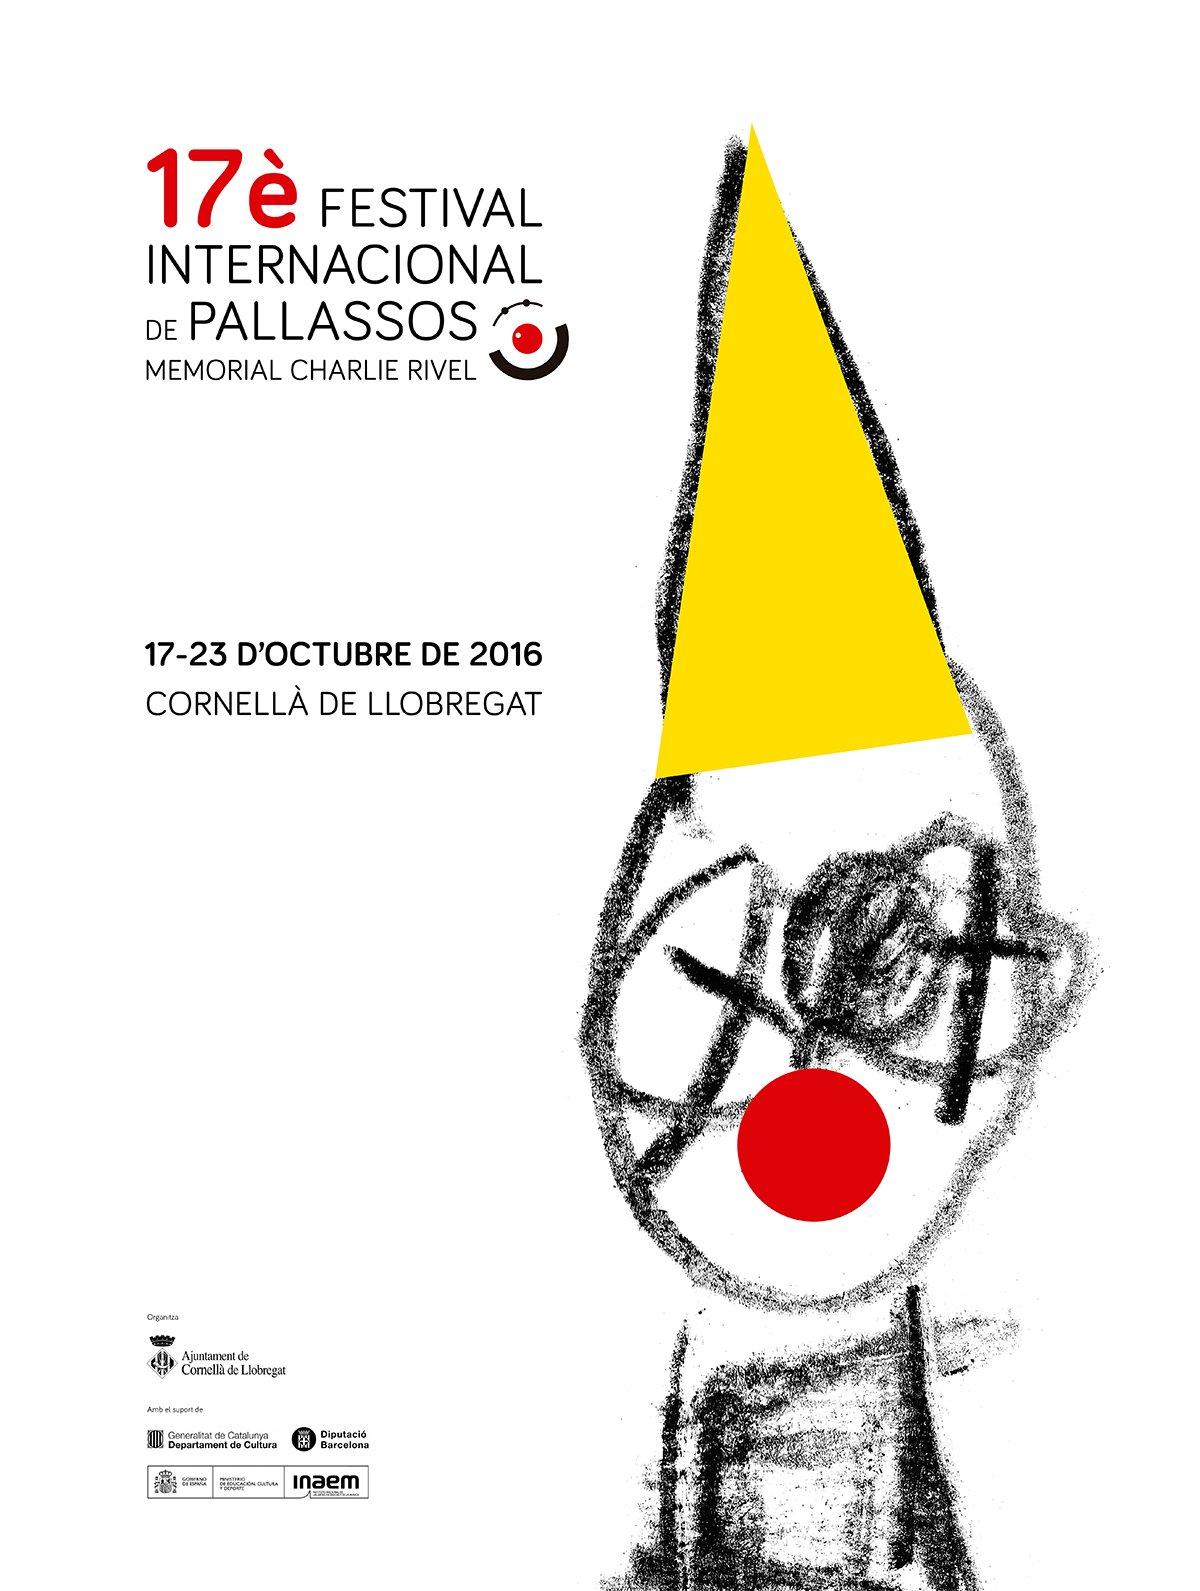 Thumbnail for Festival Internacional de Pallassos de Cornellà